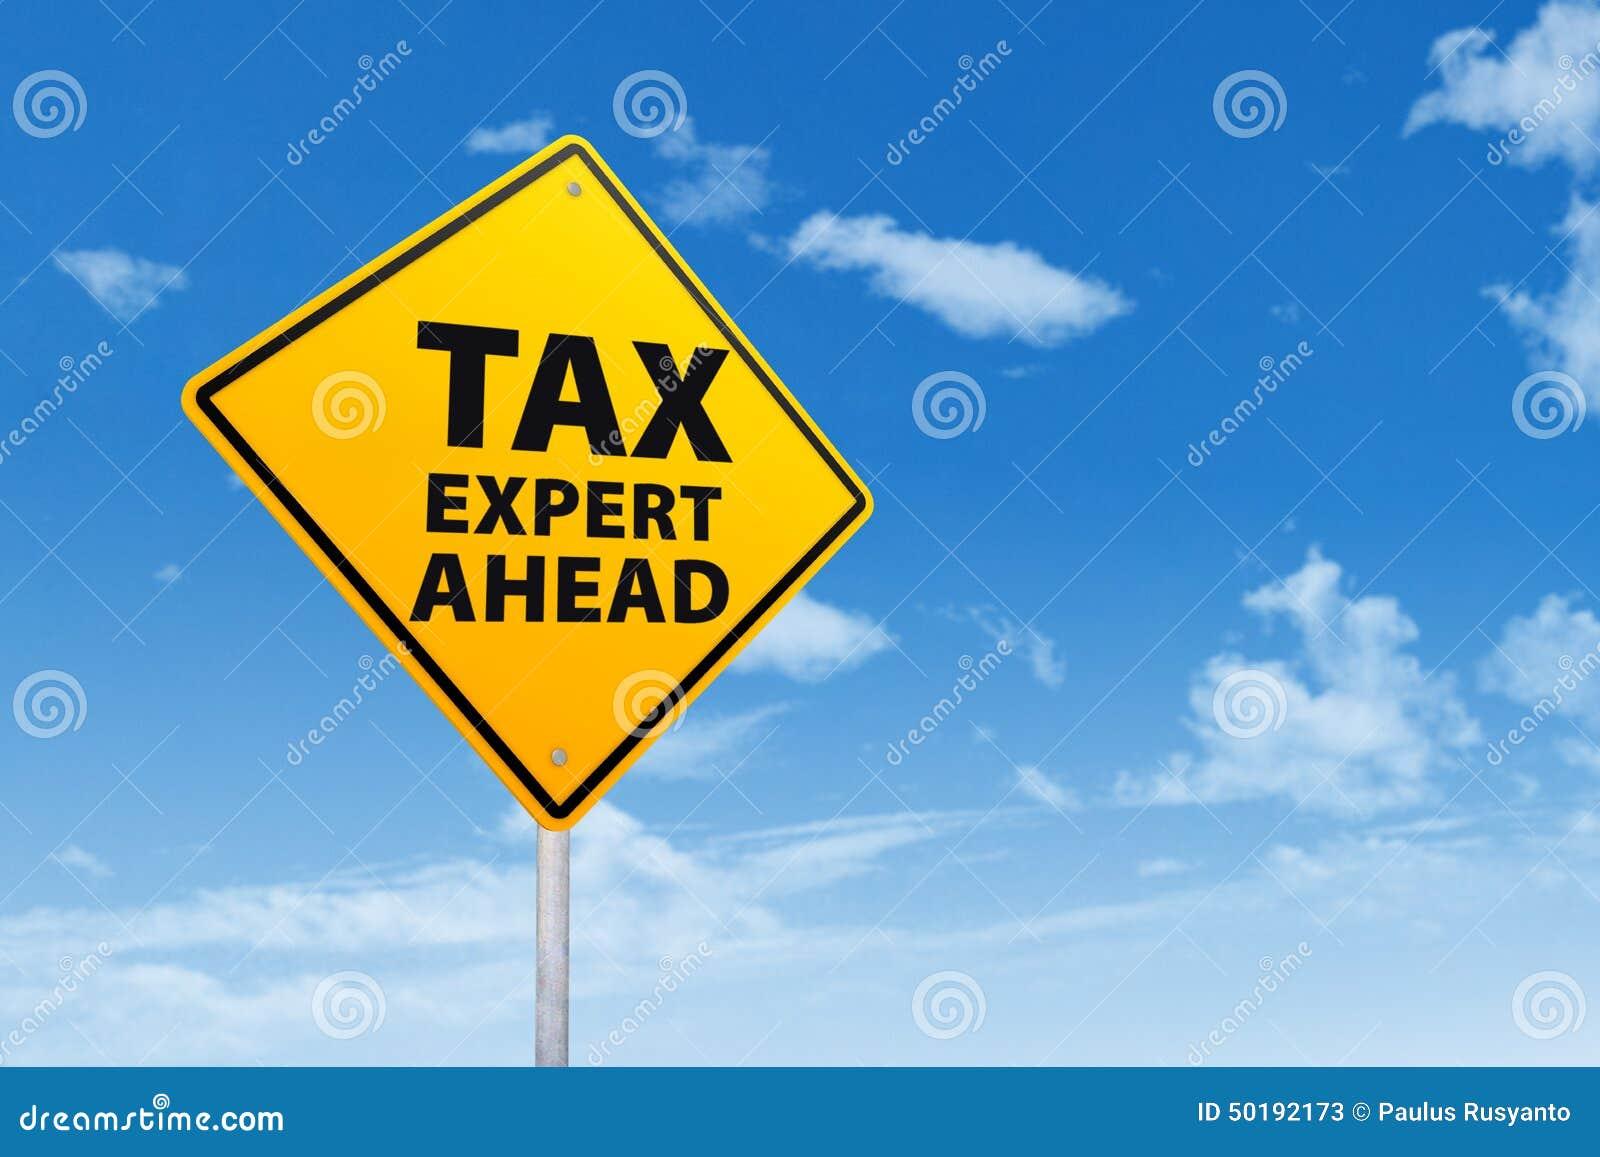 Tax Expert Ahead Stock Photo Image 50192173